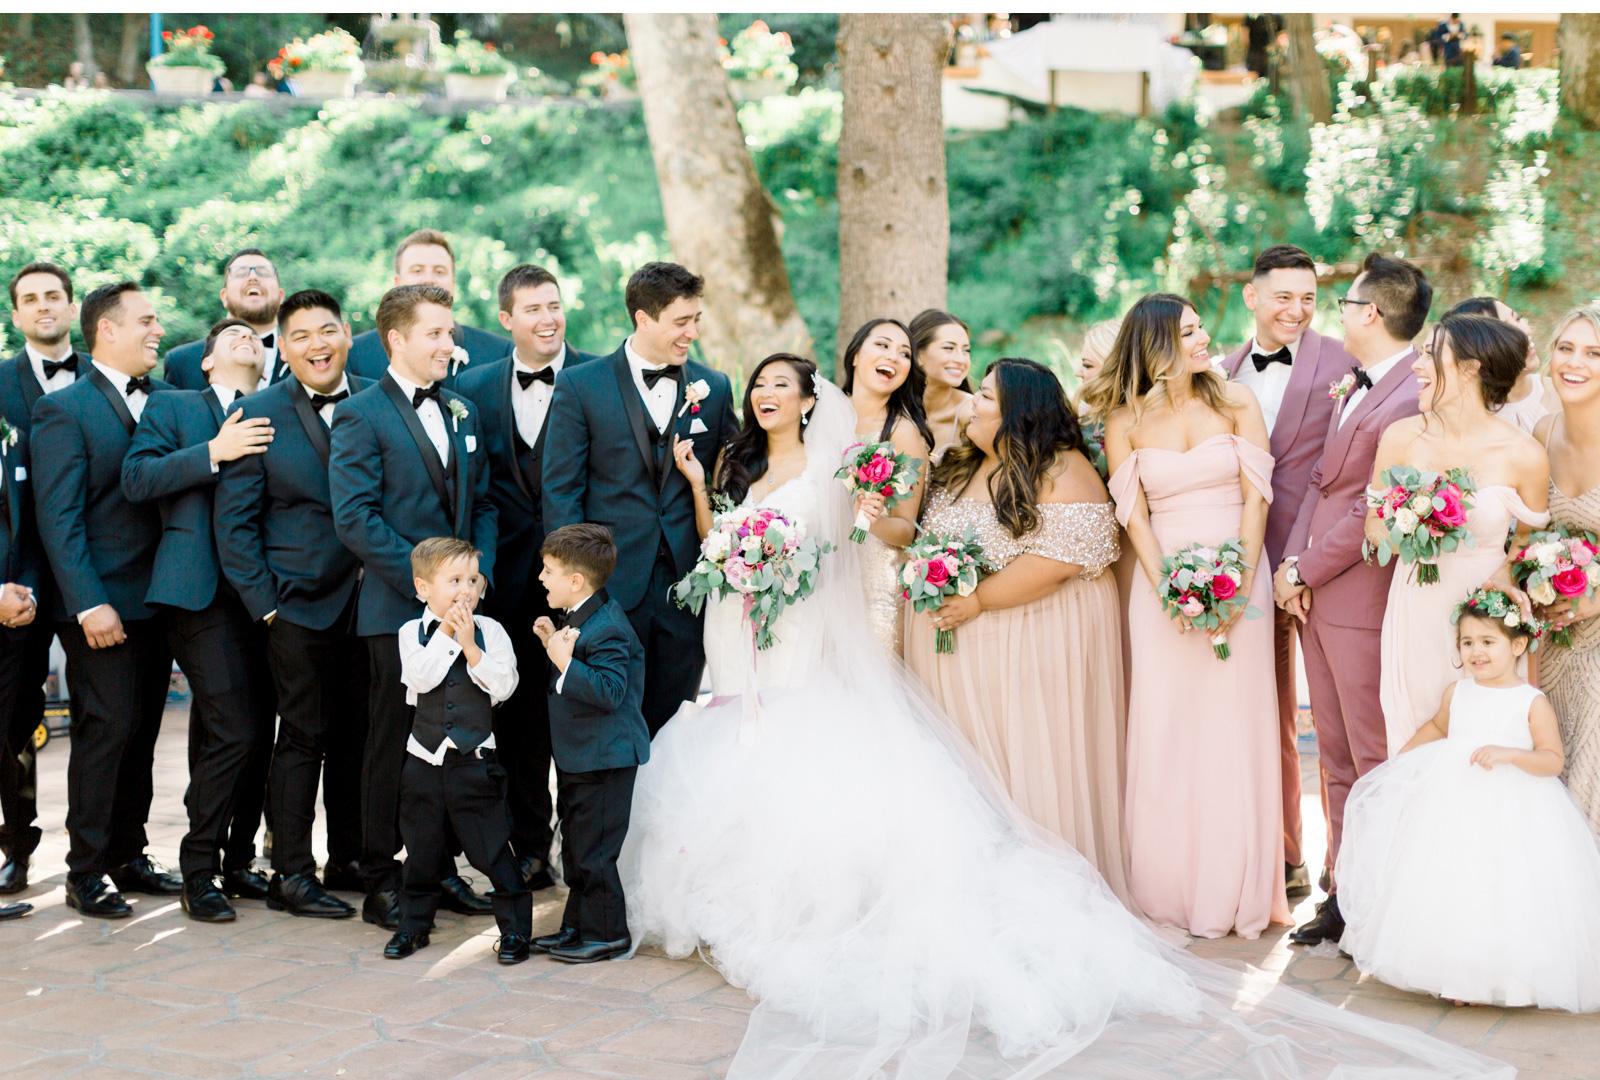 Malibu-Wedding-Triunfo-Creek-Natalie-Schutt-Photography_13.jpg